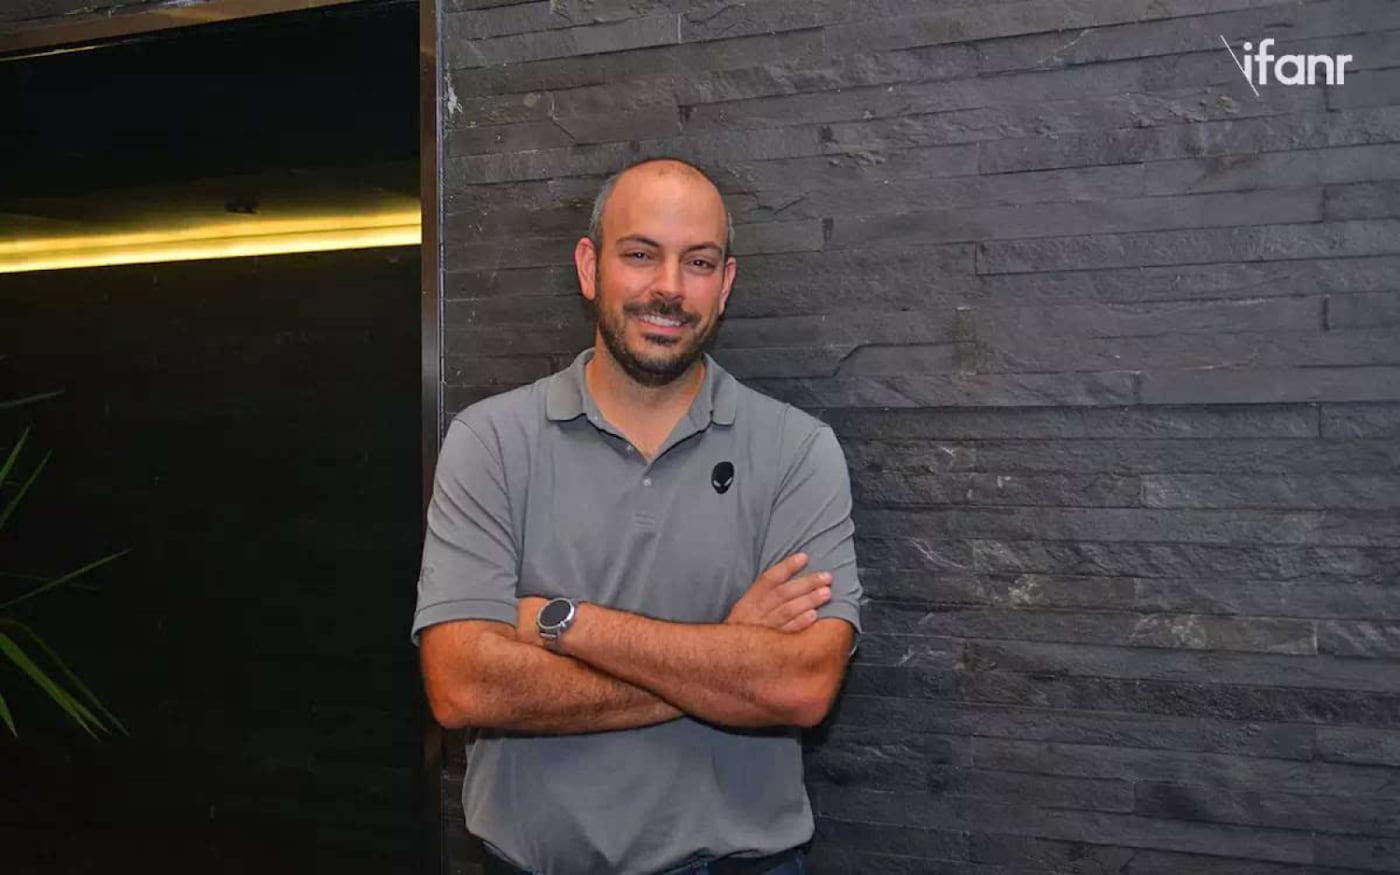 Co-fundador da Alienware deixa Dell, rumor diz que foi para tornar-se diretor de jogos da AMD